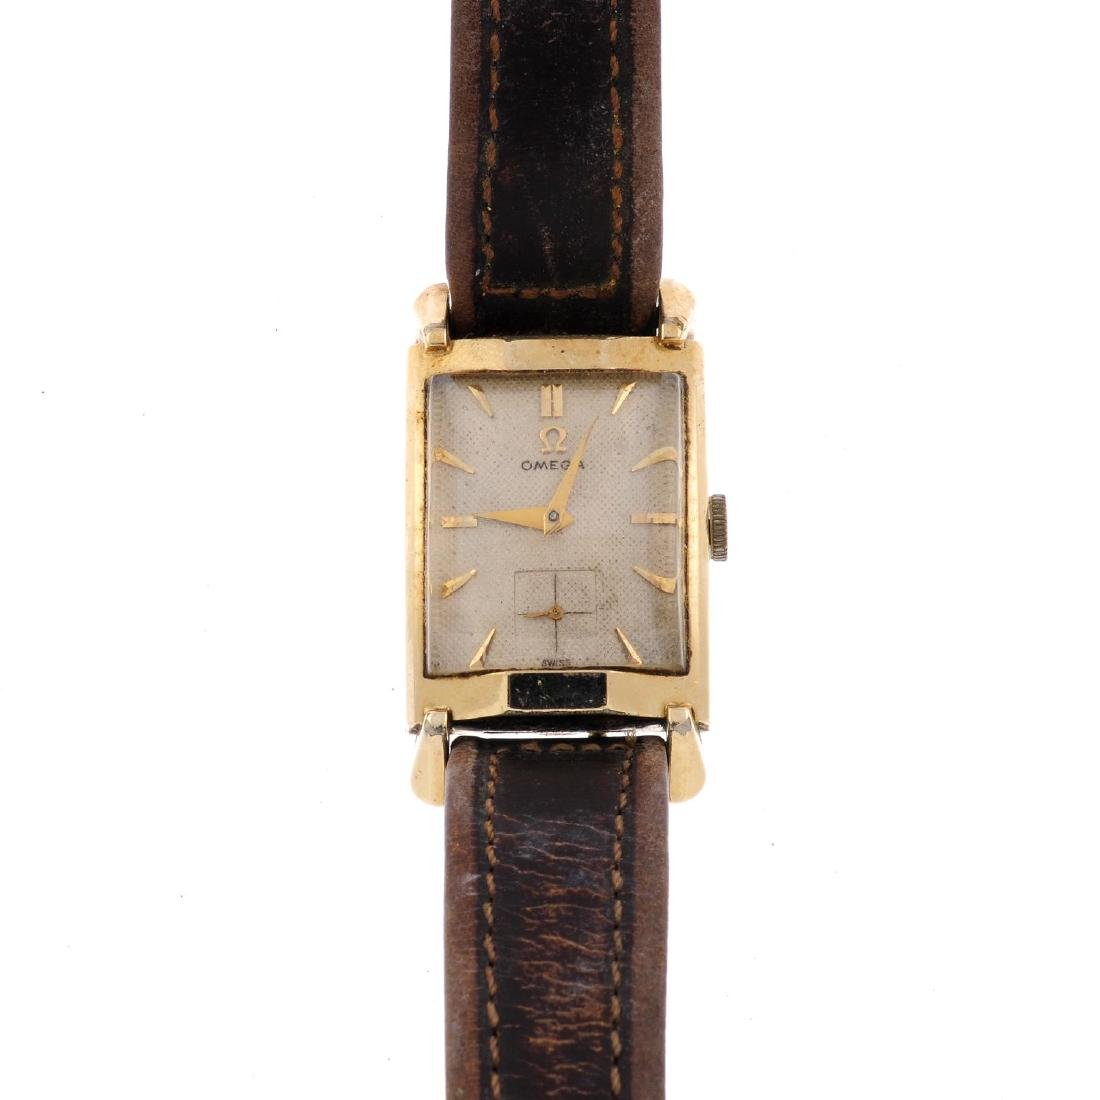 OMEGA - a gentleman's wrist watch. Rolled gold case.